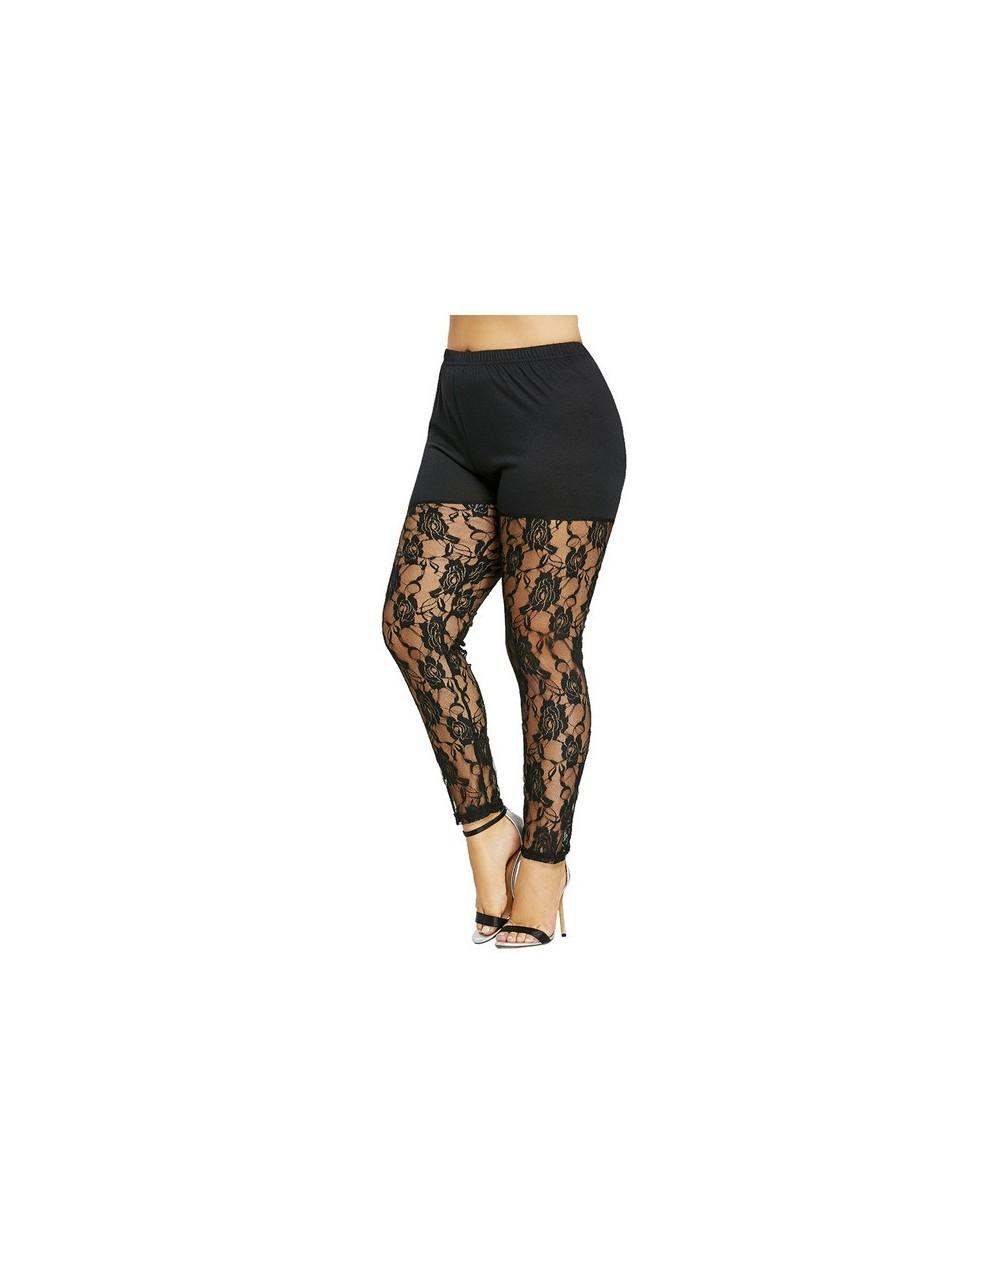 Plus Size 5XL High Waist Black Sexy Floral Lace Sheer Legging Women Skinny See Through Mesh Pants Capri Big Size 2018 - Blac...